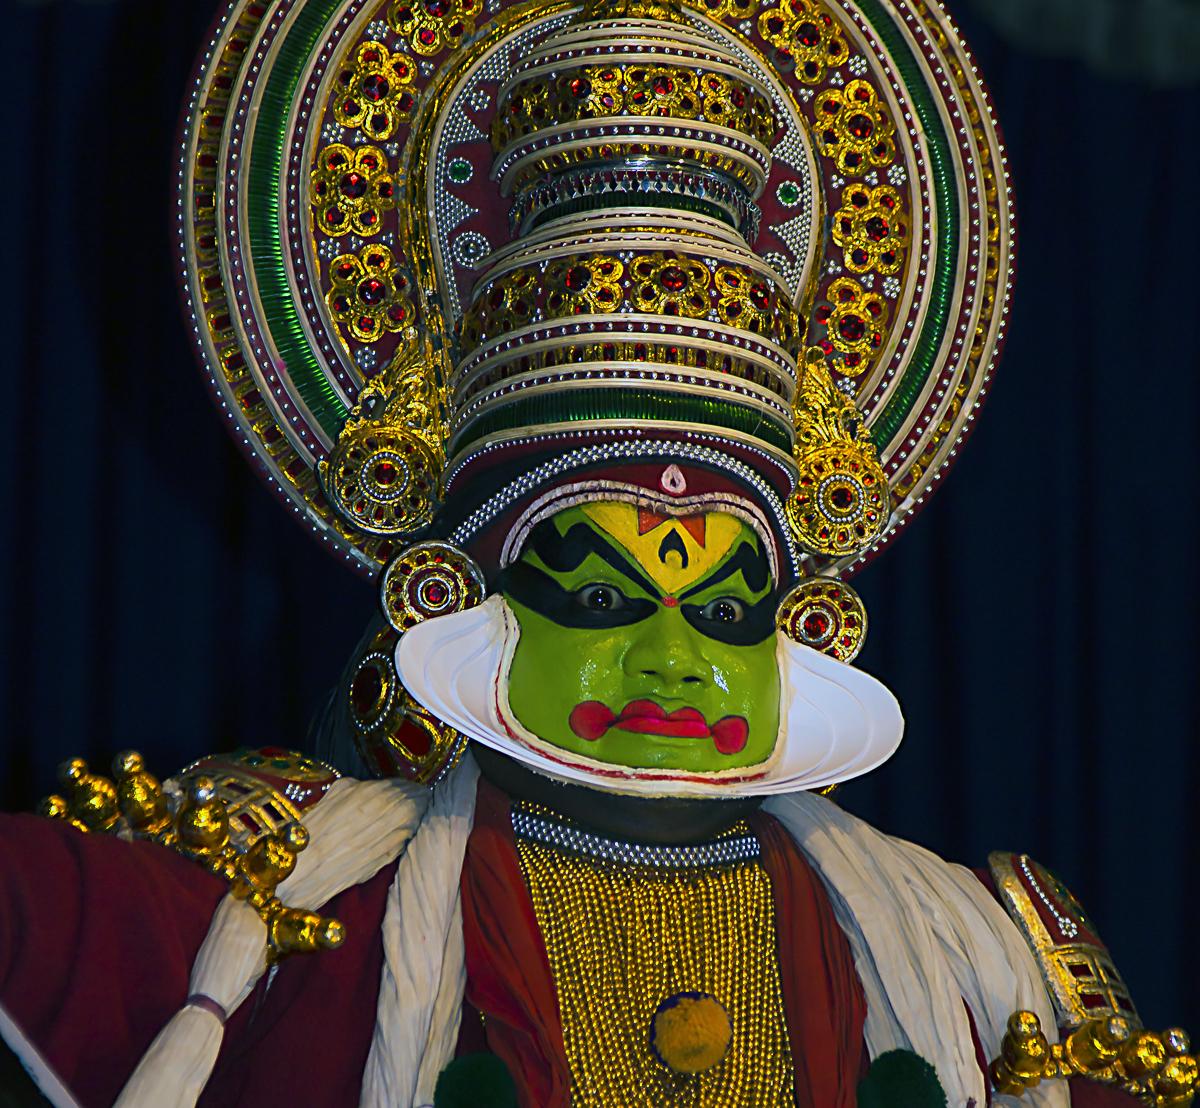 INDIEN Cochin Kerala Menschen Masken FINEST-onTour 9059.jpg